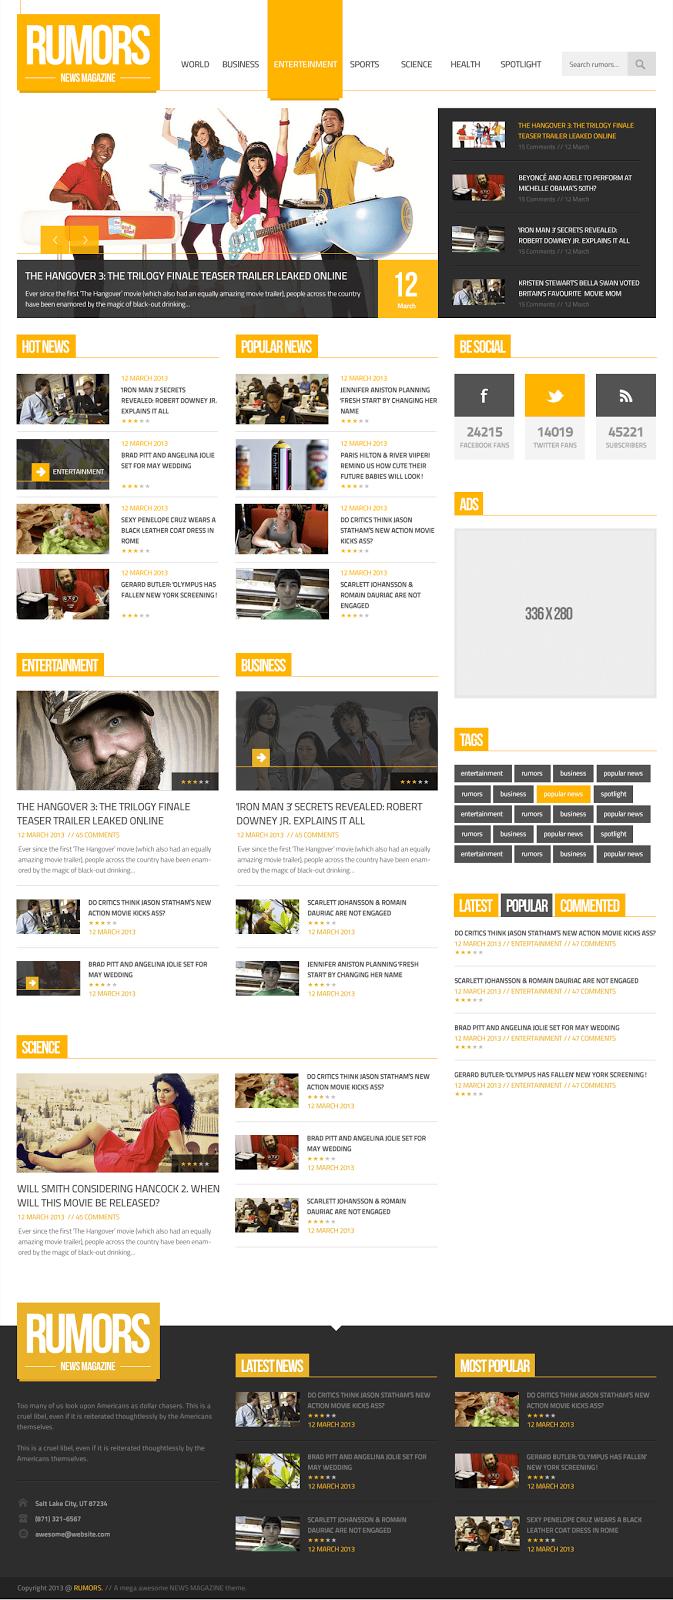 Rumors Homepage Template PSD